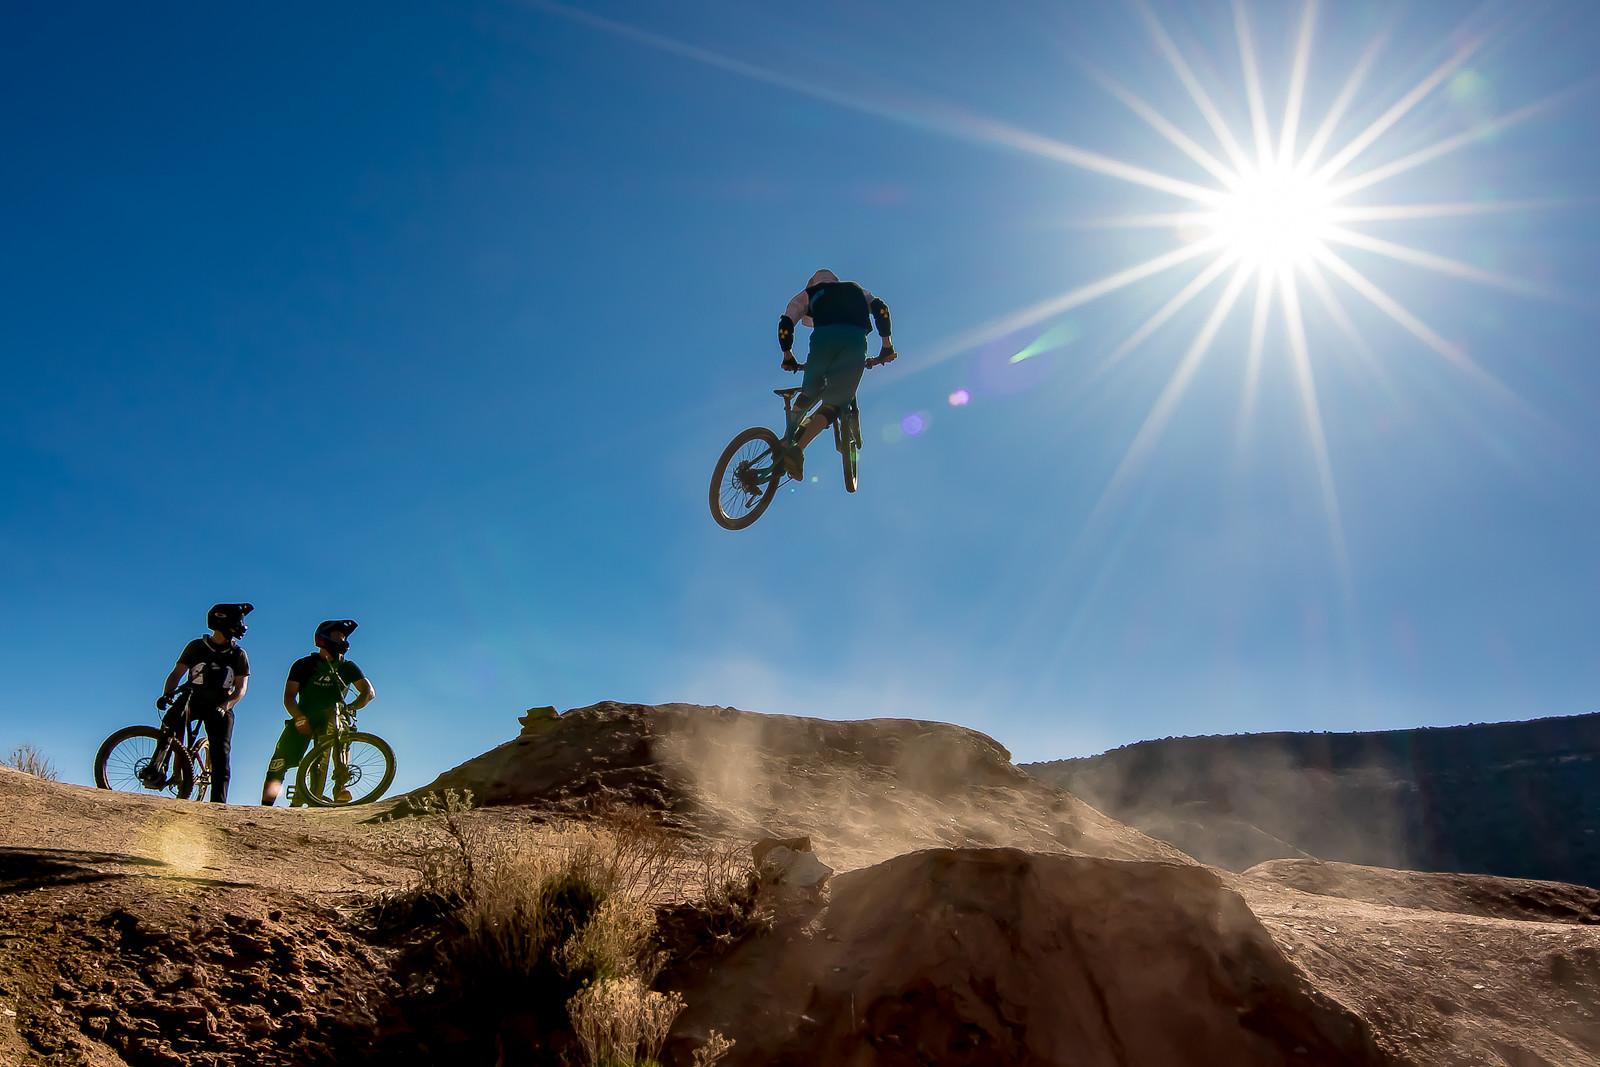 Huck it - scottcodyphoto - Mountain Biking Pictures - Vital MTB